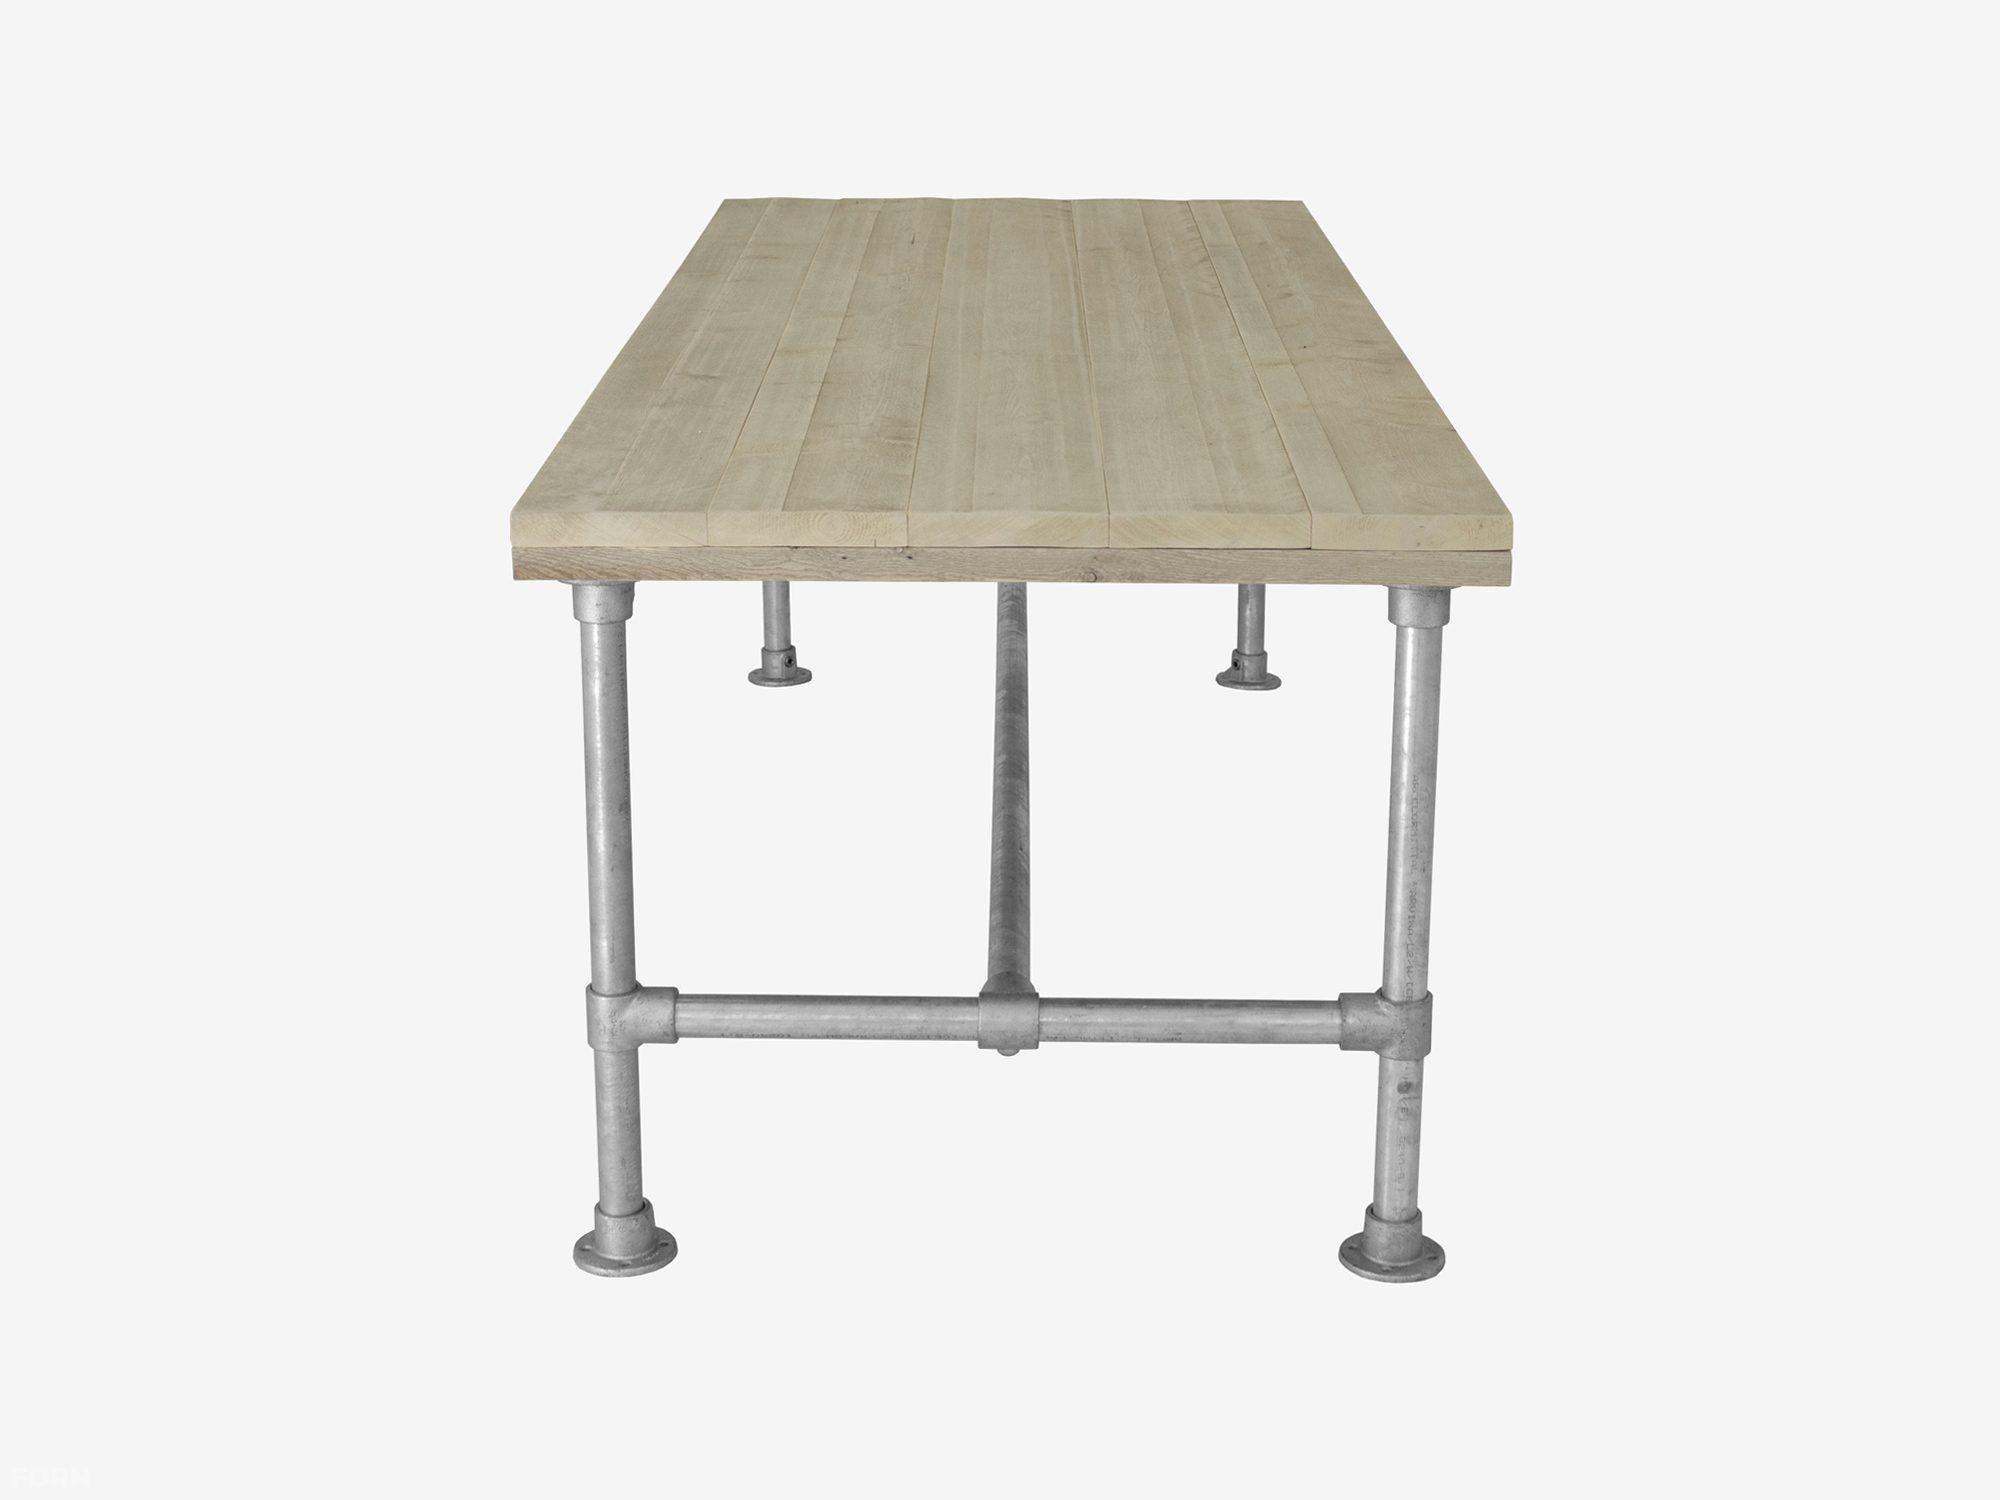 Steigerhouten tafel met steigerbuis onderstel f rn - Tafel met chevet ...